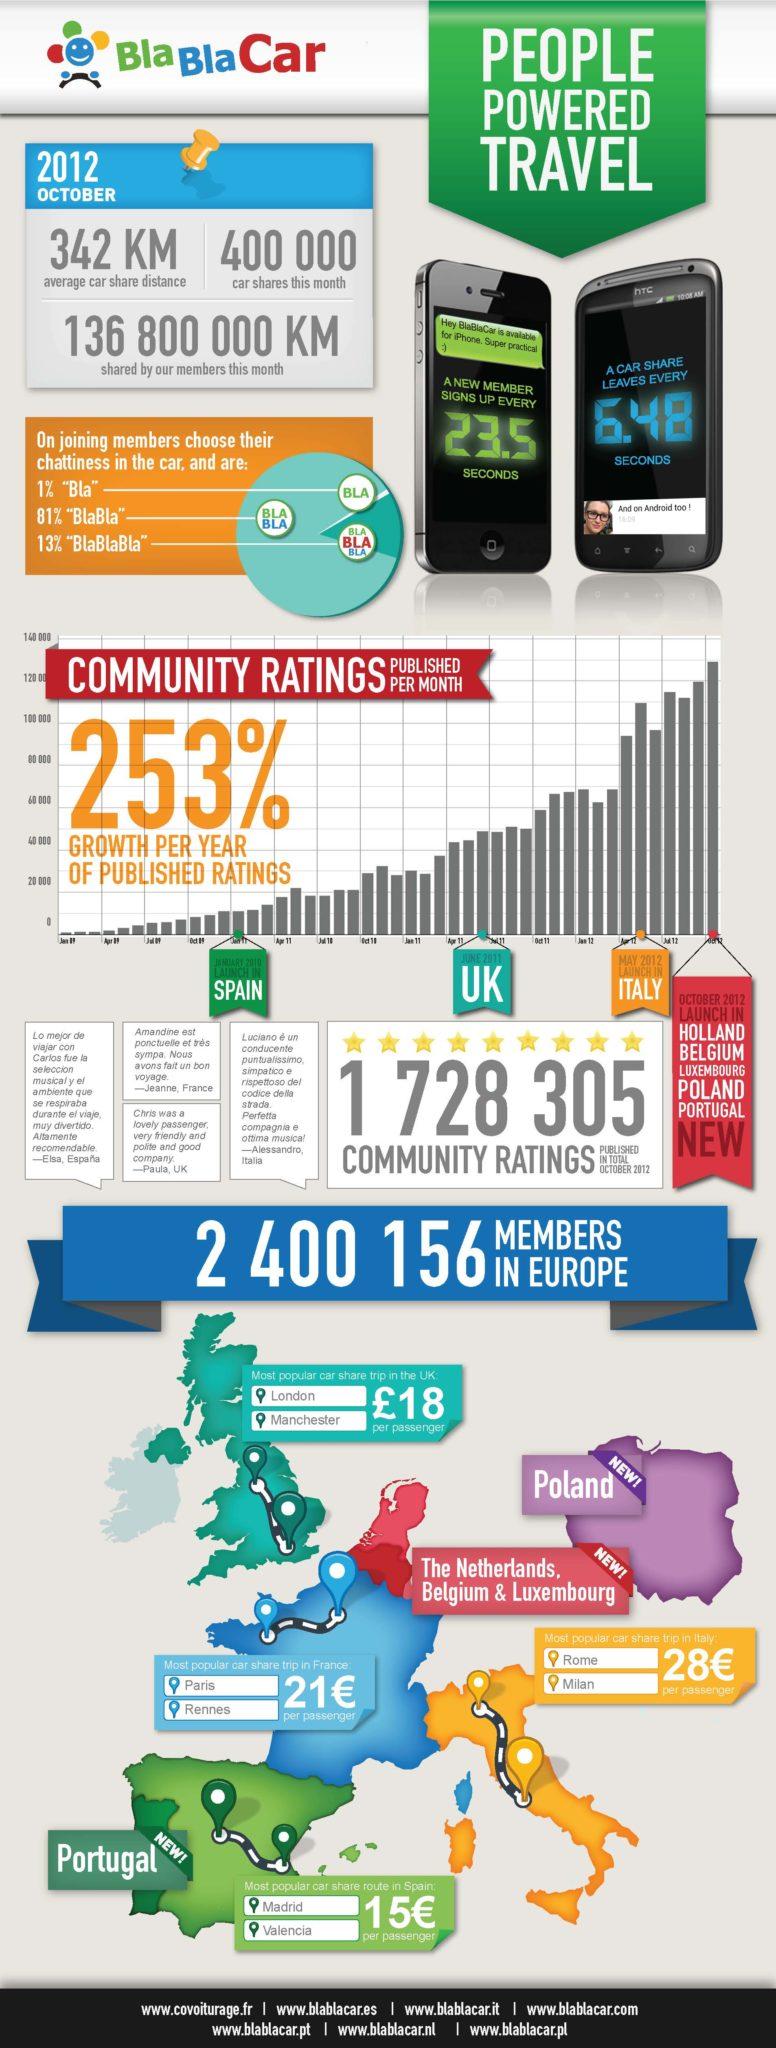 BlaBlaCar-figures-Oct-2012